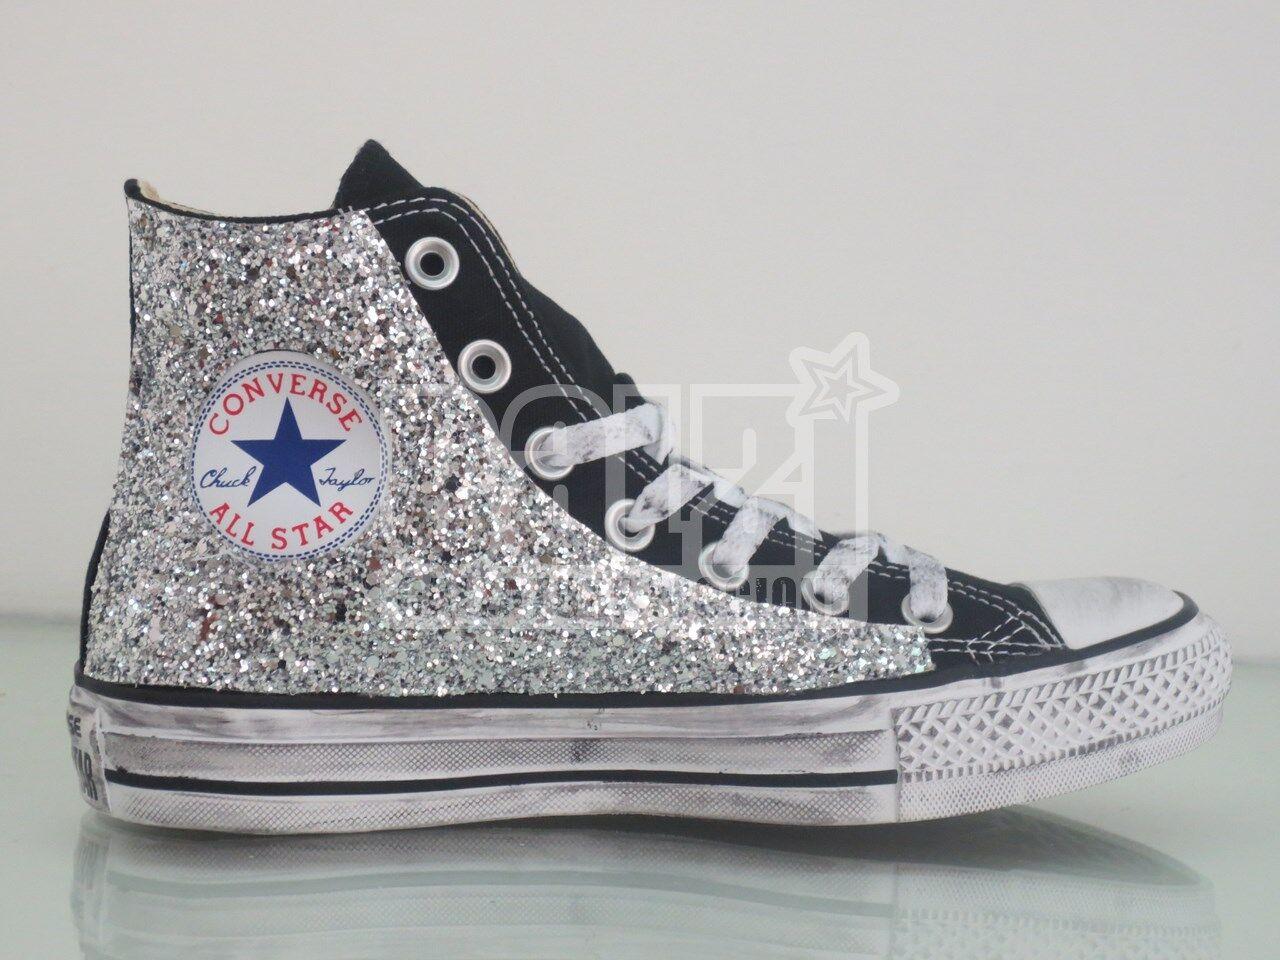 Zapatos de mujer baratos zapatos de mujer Converse all star Hi nero black  glitter argento artigianali